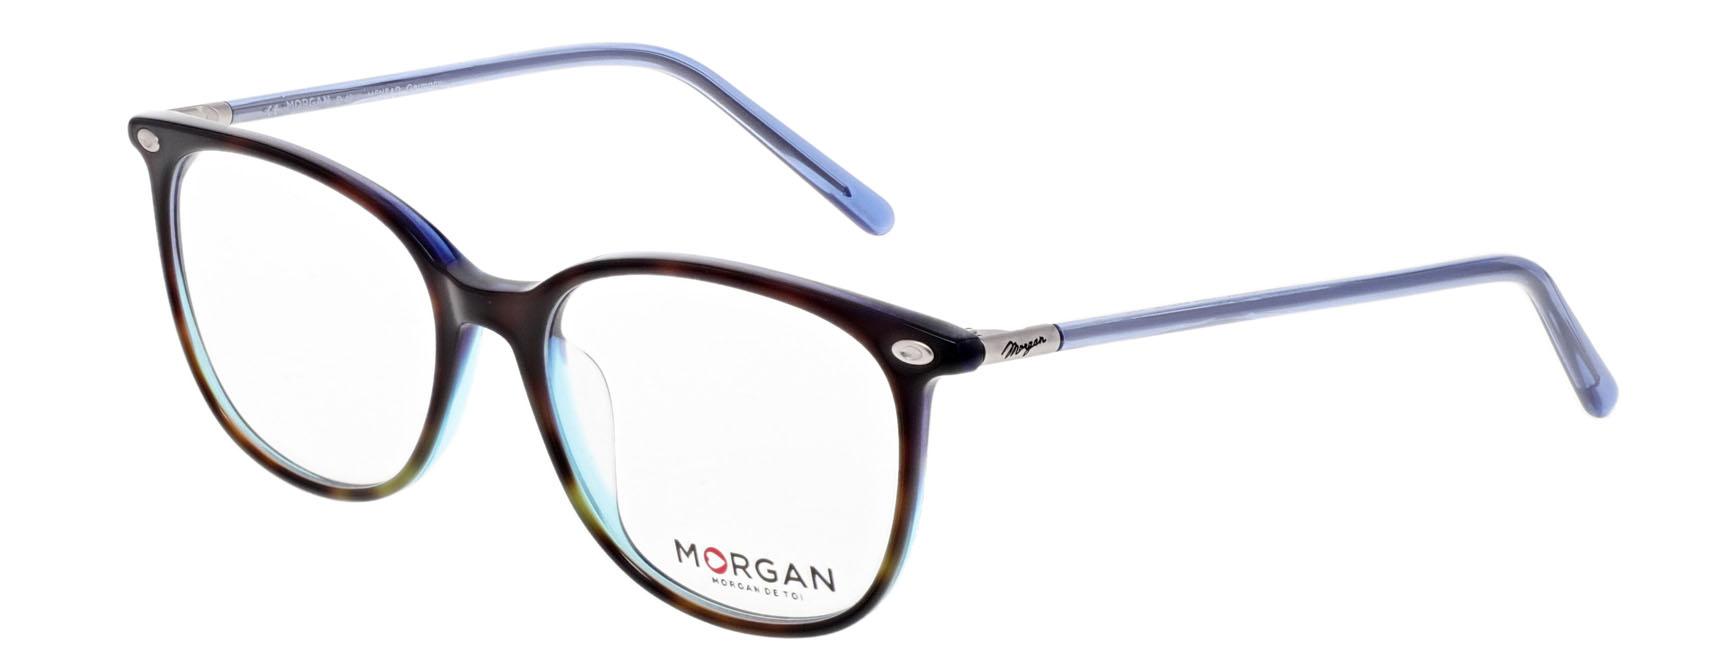 Morgan 202024 4797